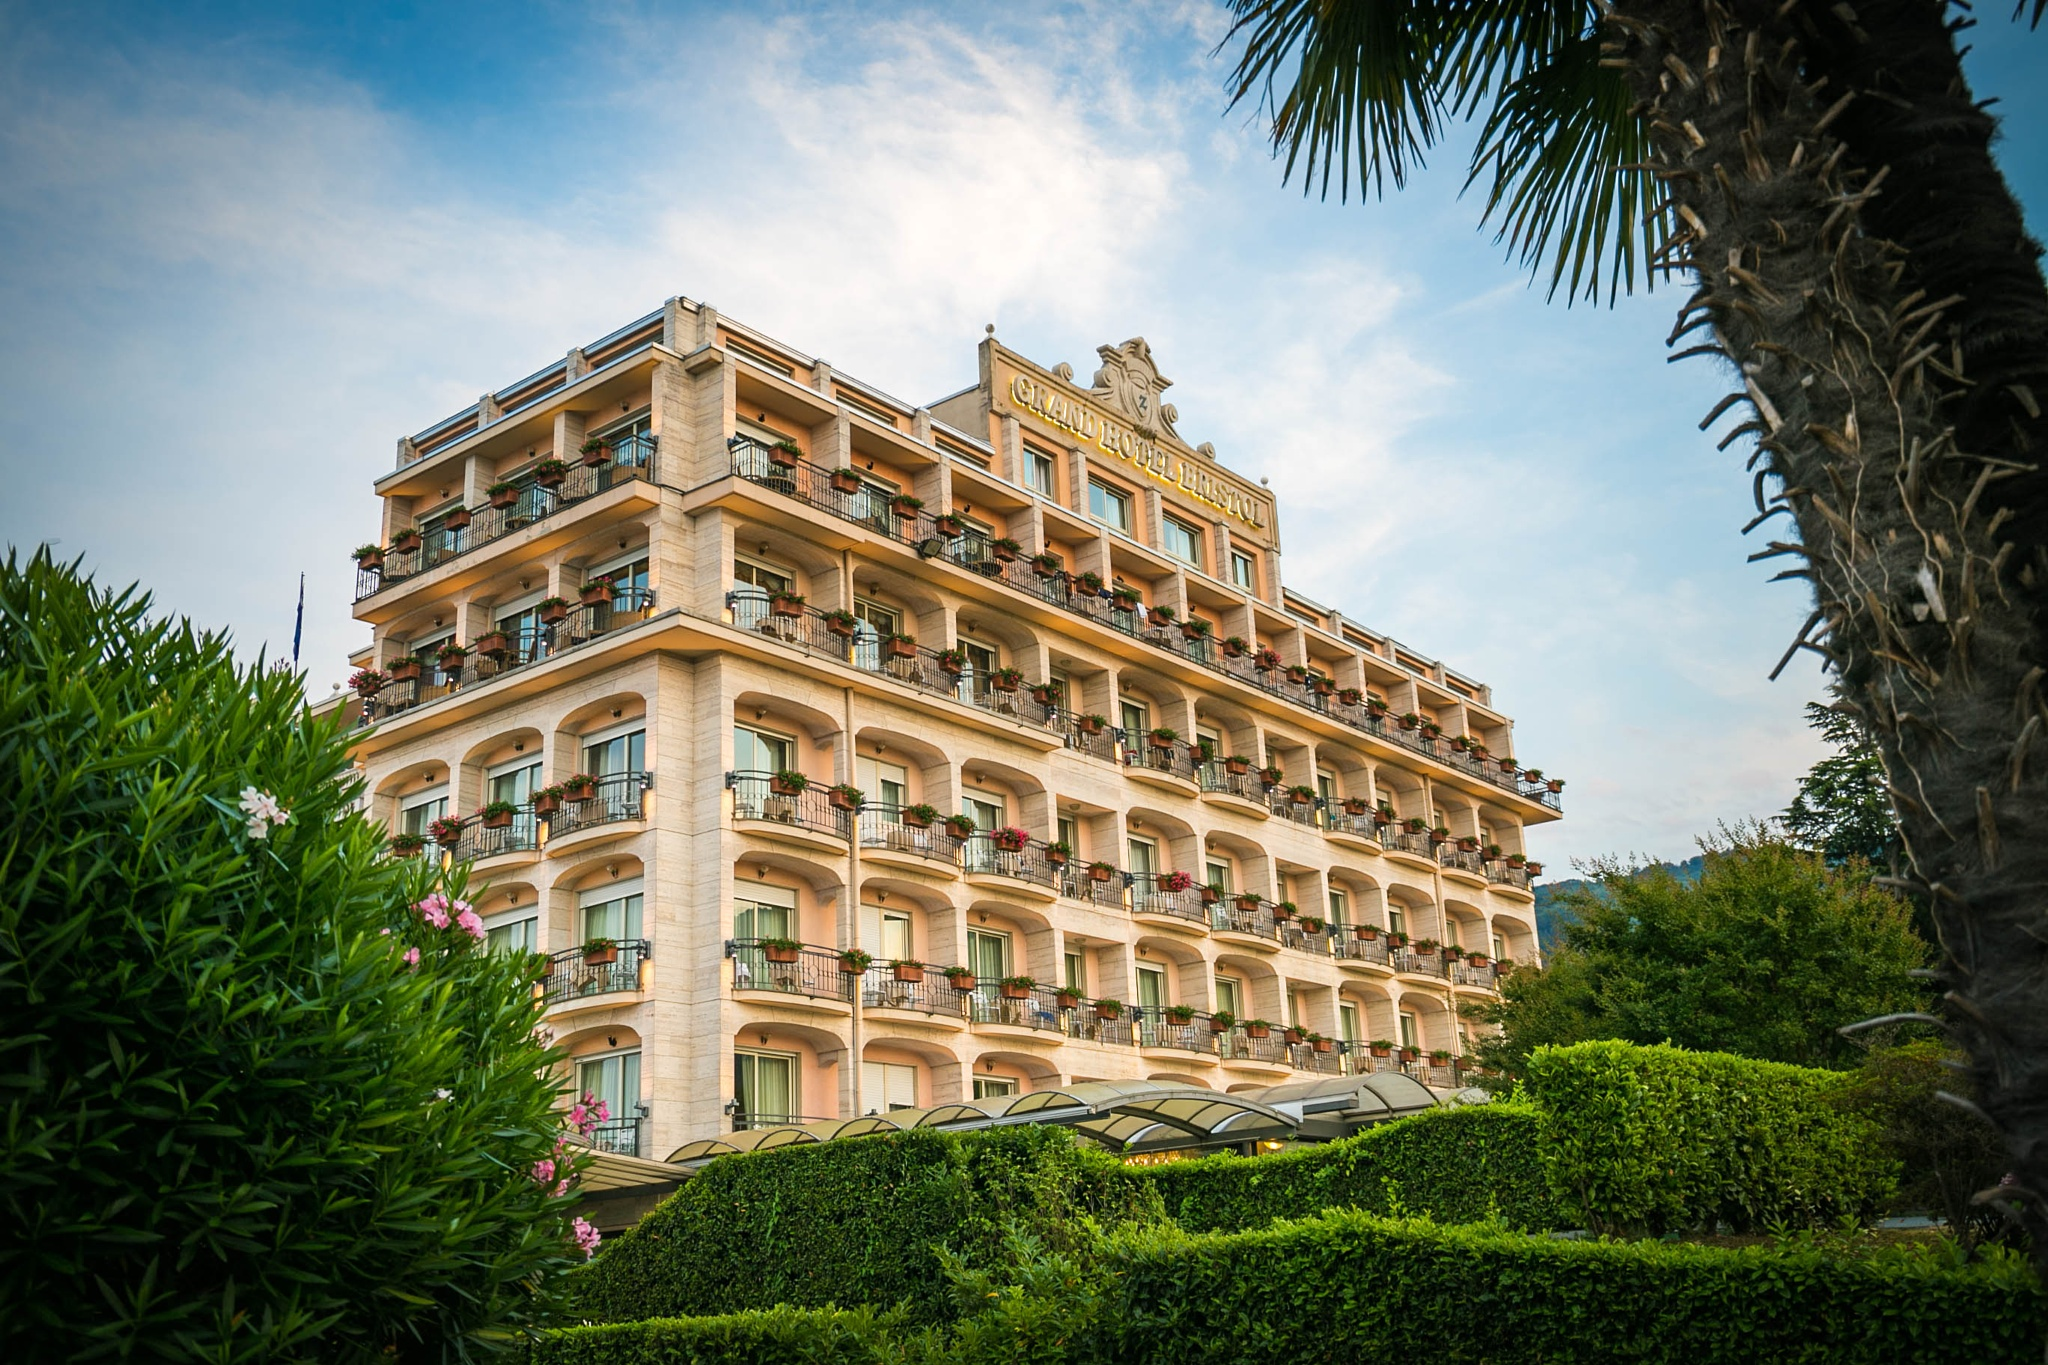 Hotel Bristol Stresa by André Soerensen